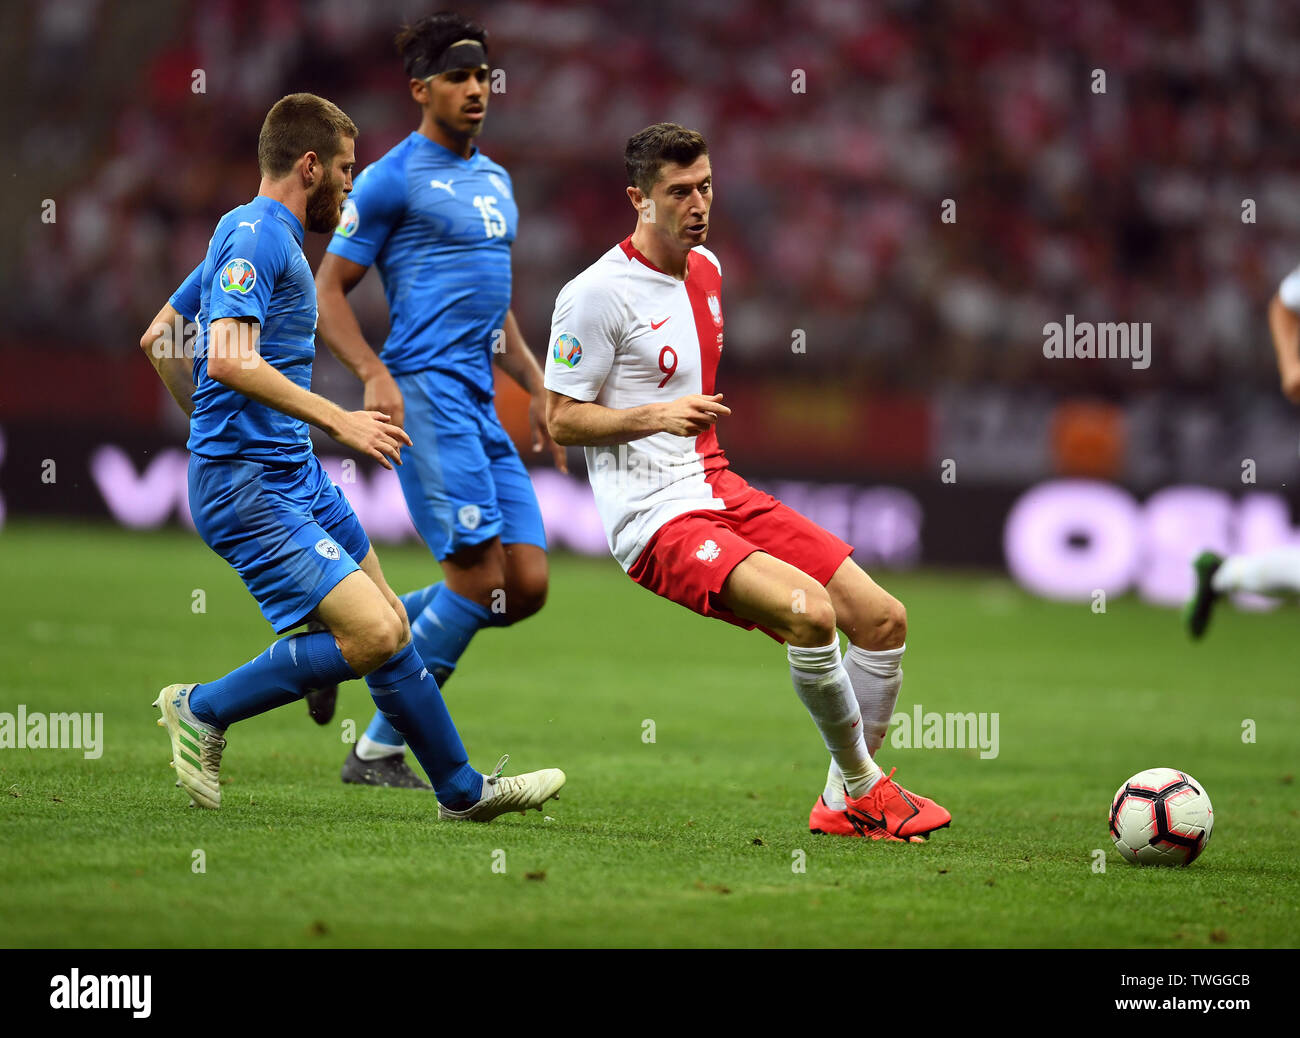 Warsaw, Poland, June 10, 2019: EURO 2020 qualifing round, group stage, Poland wins 4:0 with Izarel on PGE Narodowy. Robert Lewandowski (Poland) - Stock Image